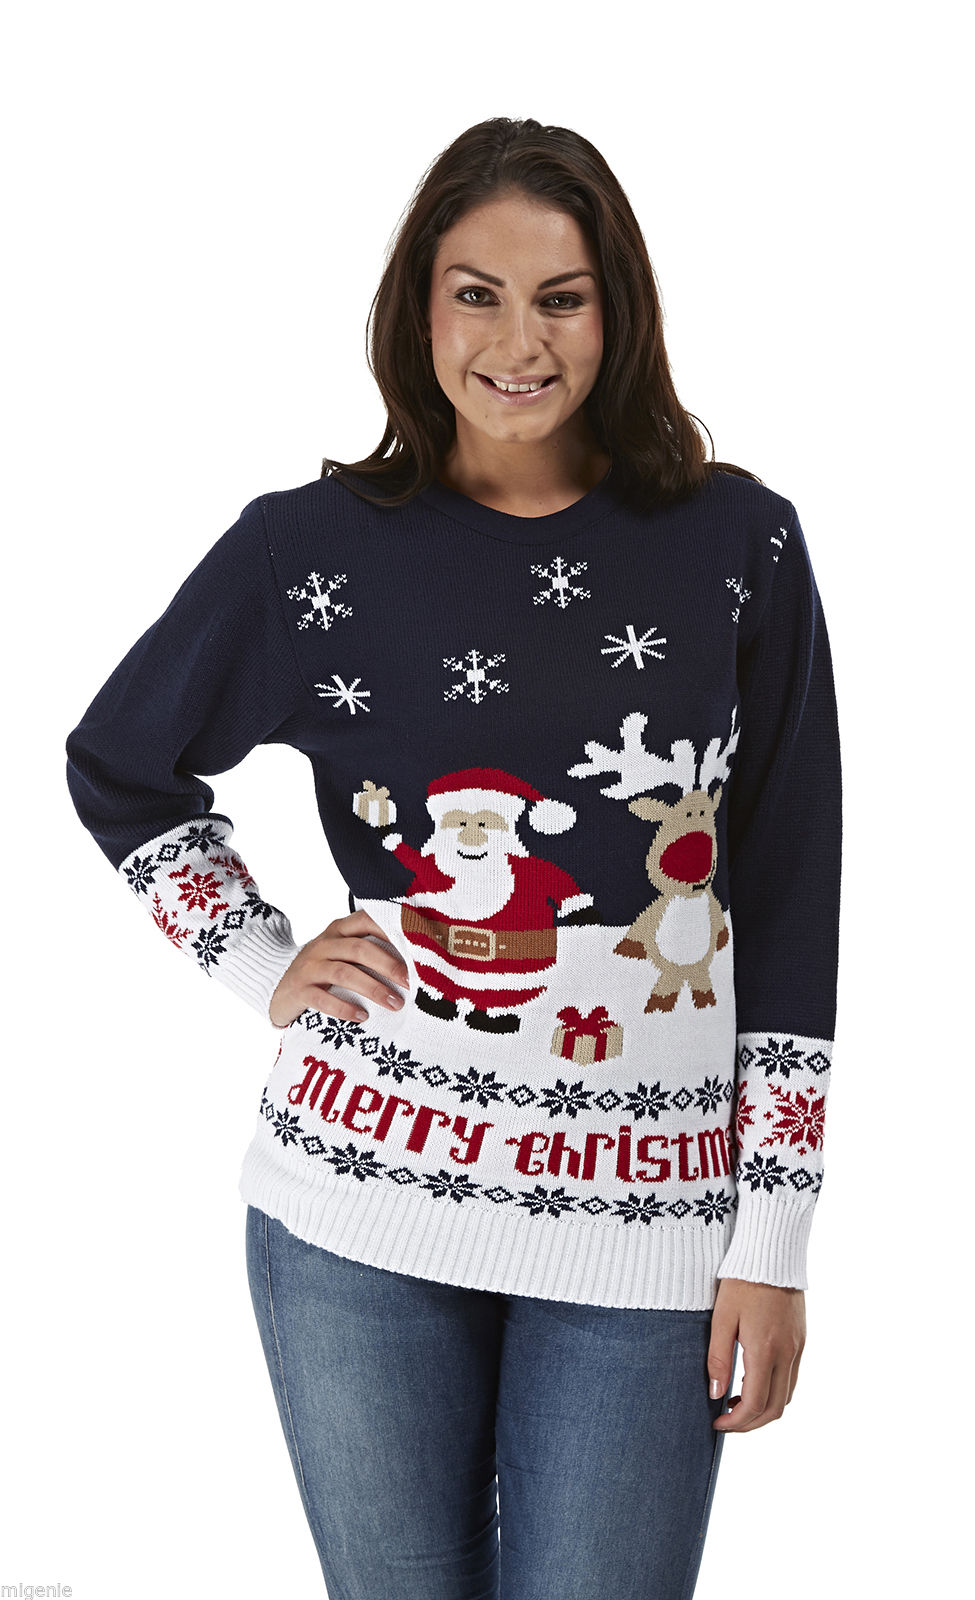 Kersttrui Dames Rendier.Kerstman Kado Foute Kersttrui Kopen Grootste Aanbod Kersttruien